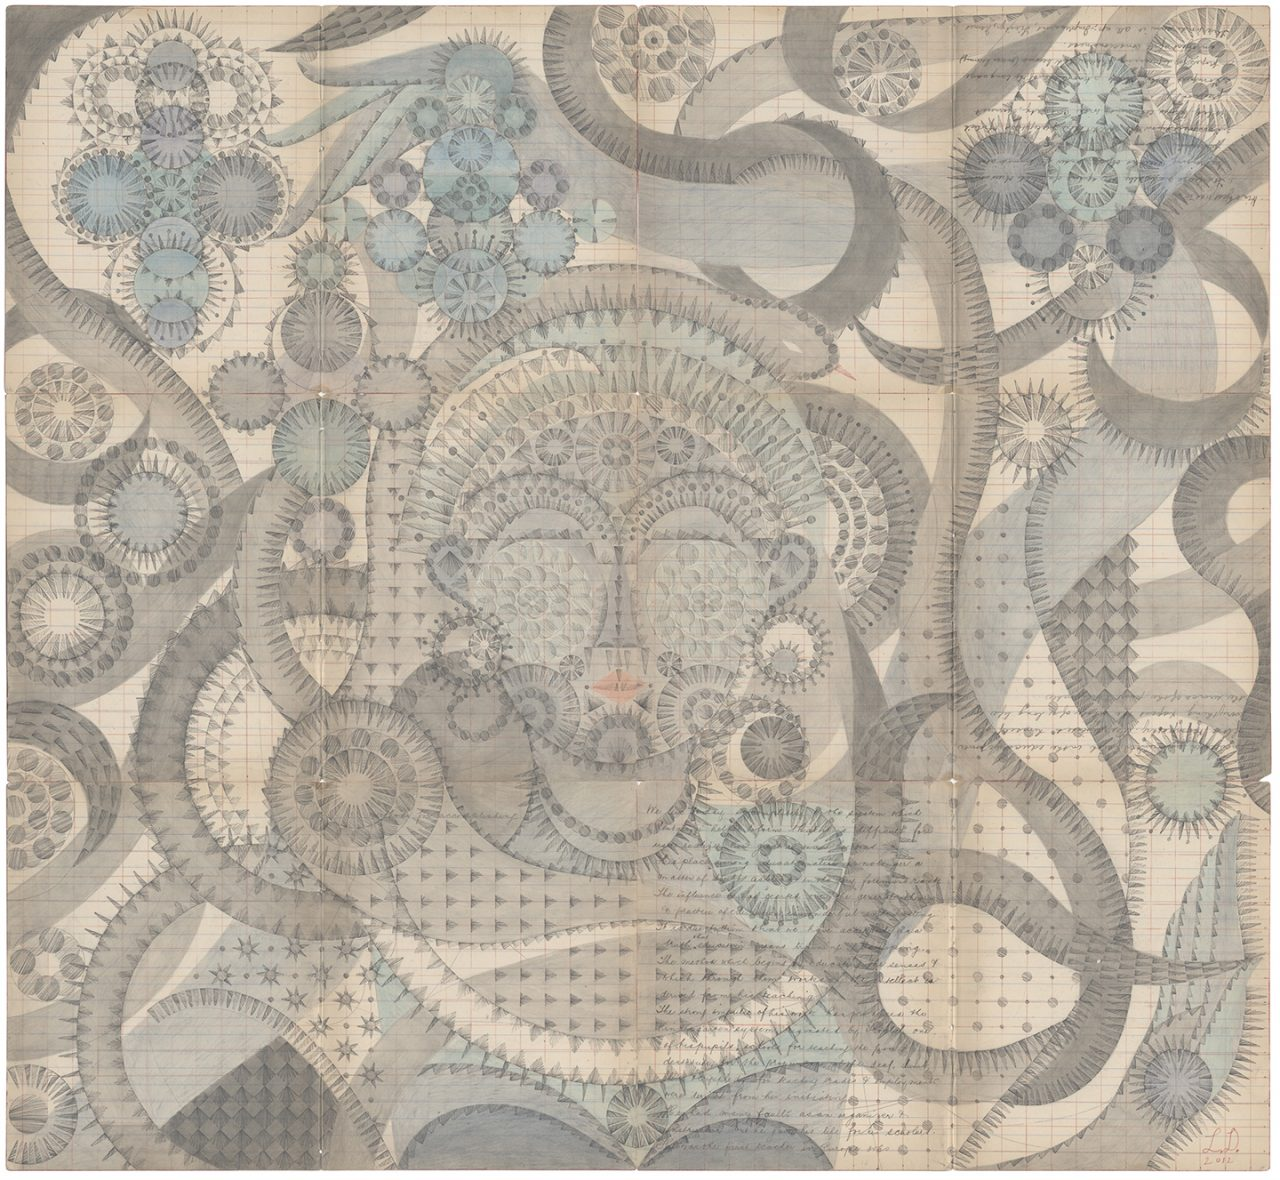 Tide Fulcrum & The Motion of Fixed Stars | Medusa, 2012